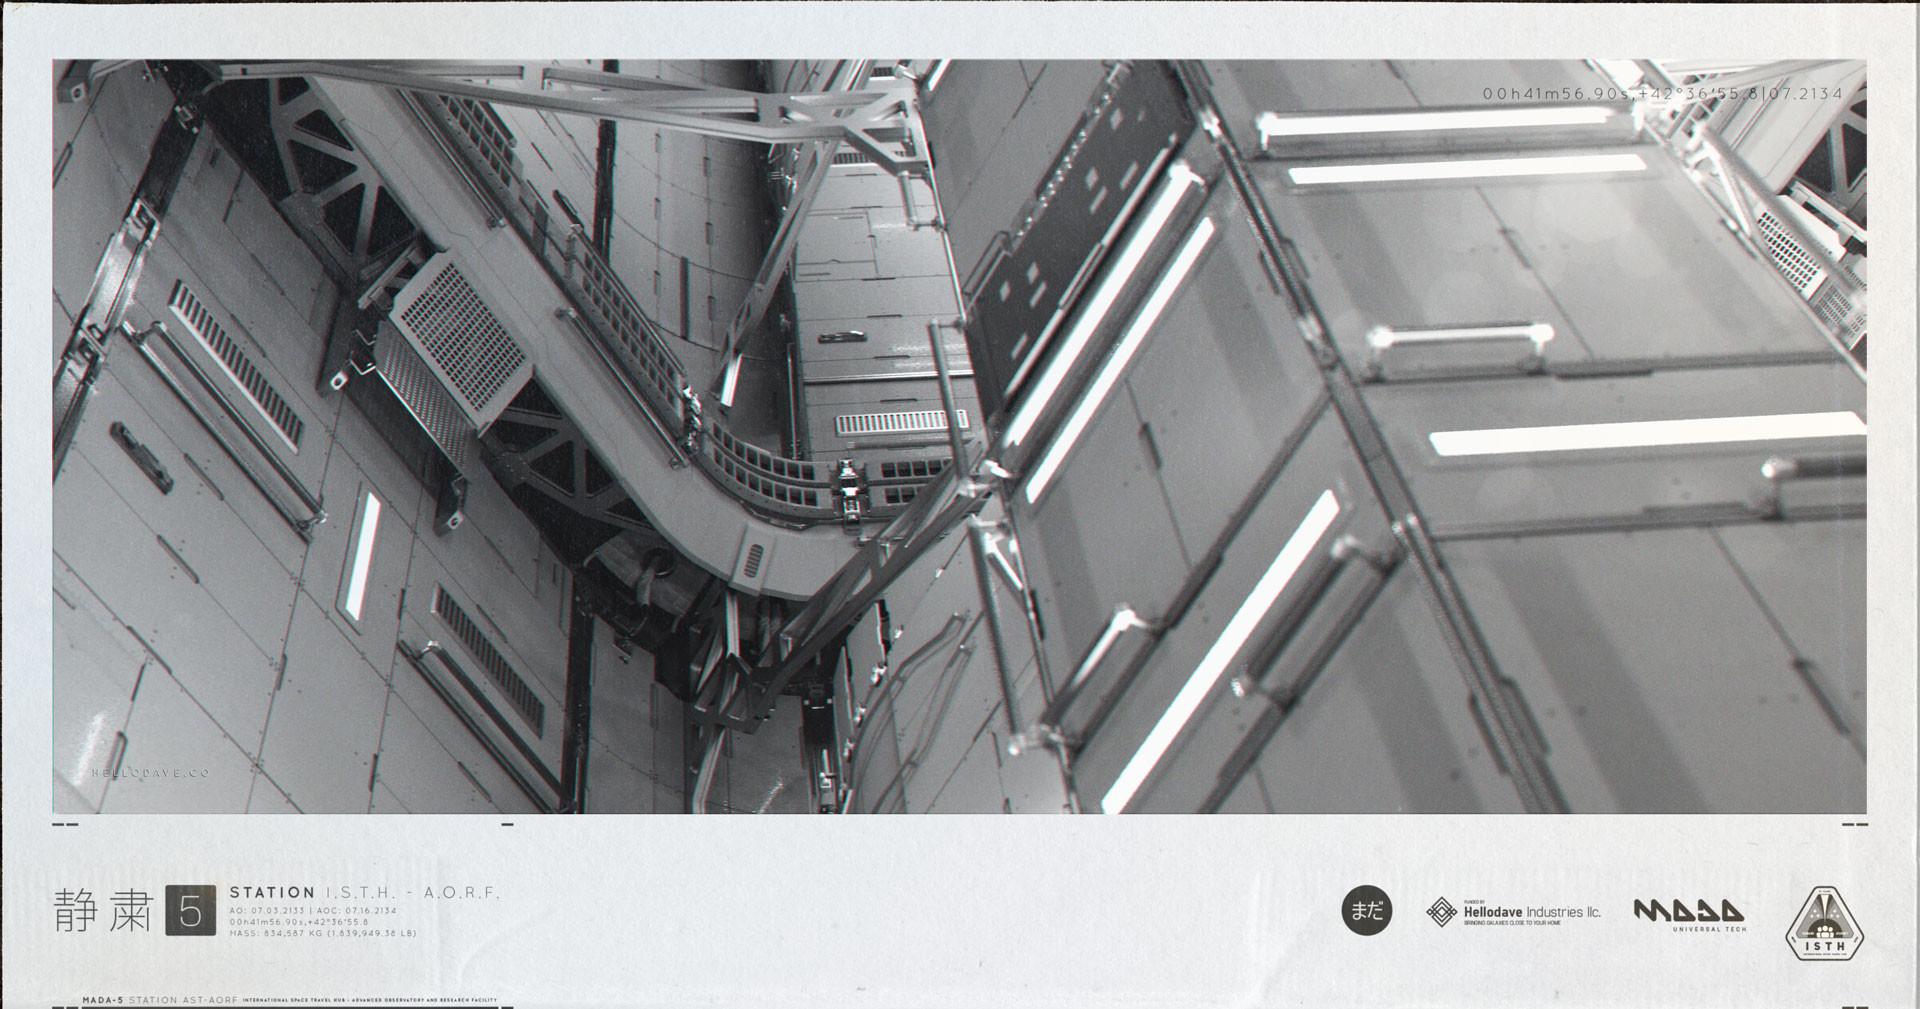 Davison carvalho station horizontal mon 03a